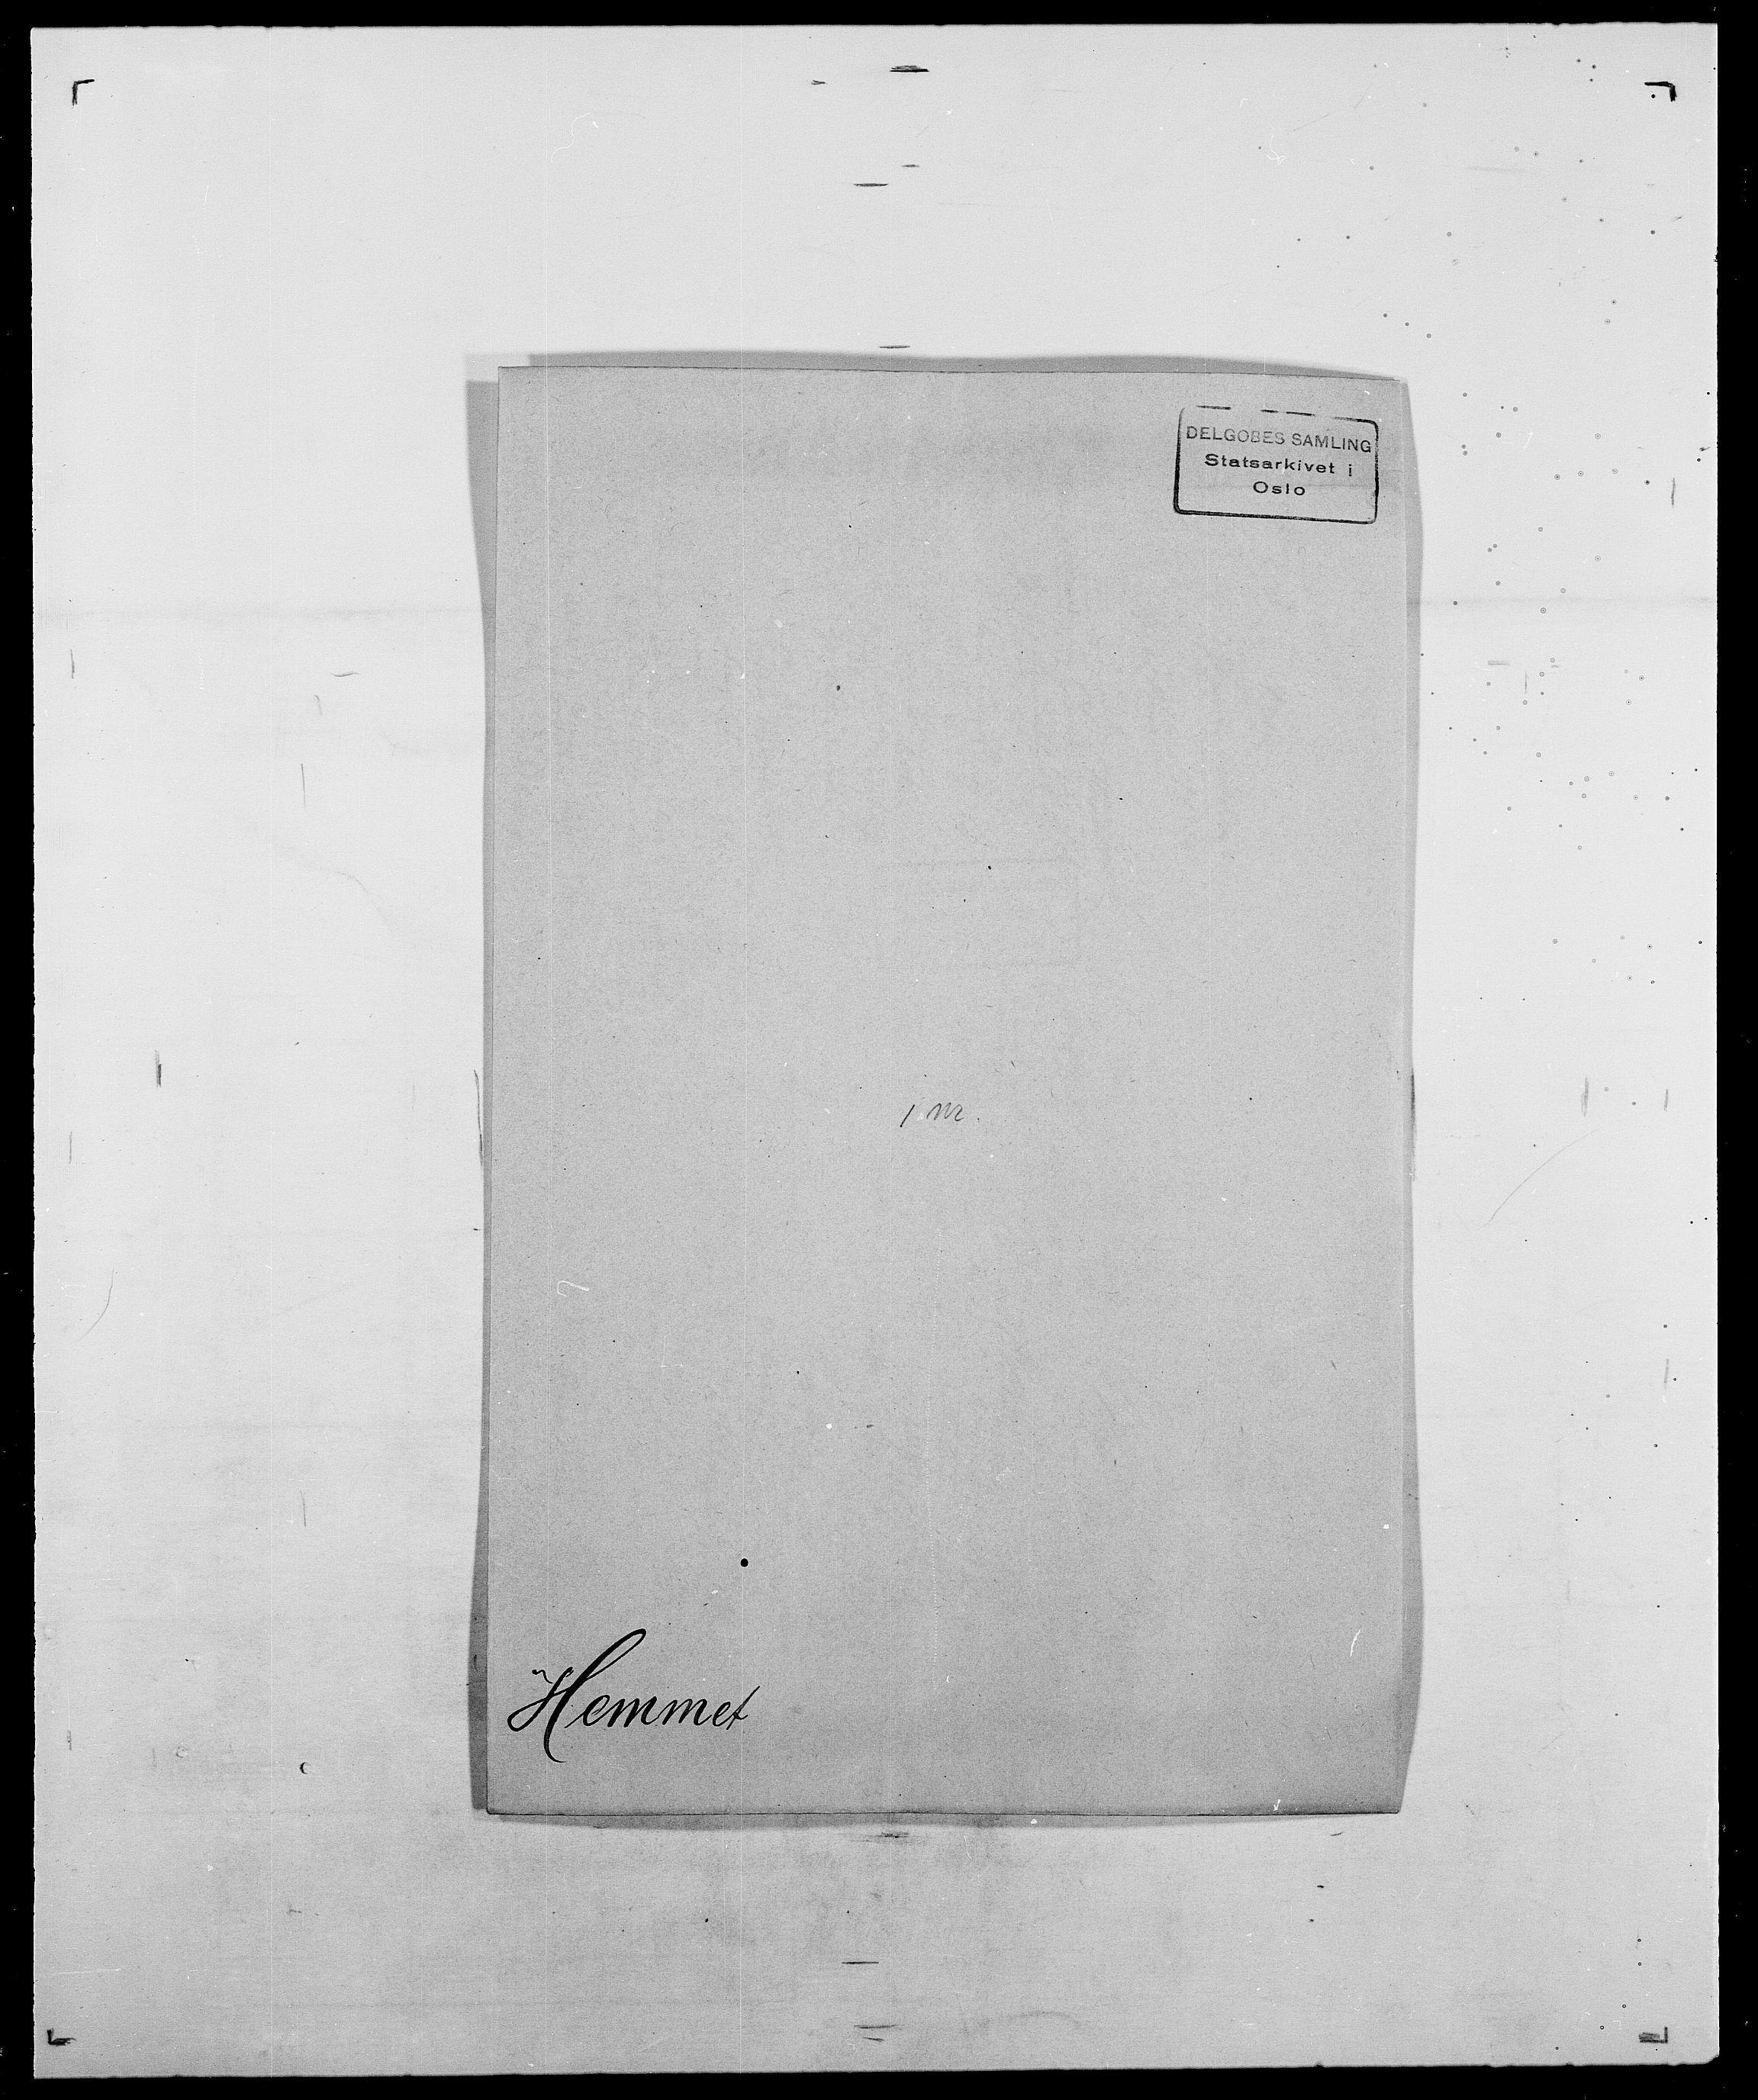 SAO, Delgobe, Charles Antoine - samling, D/Da/L0017: Helander - Hjørne, s. 156